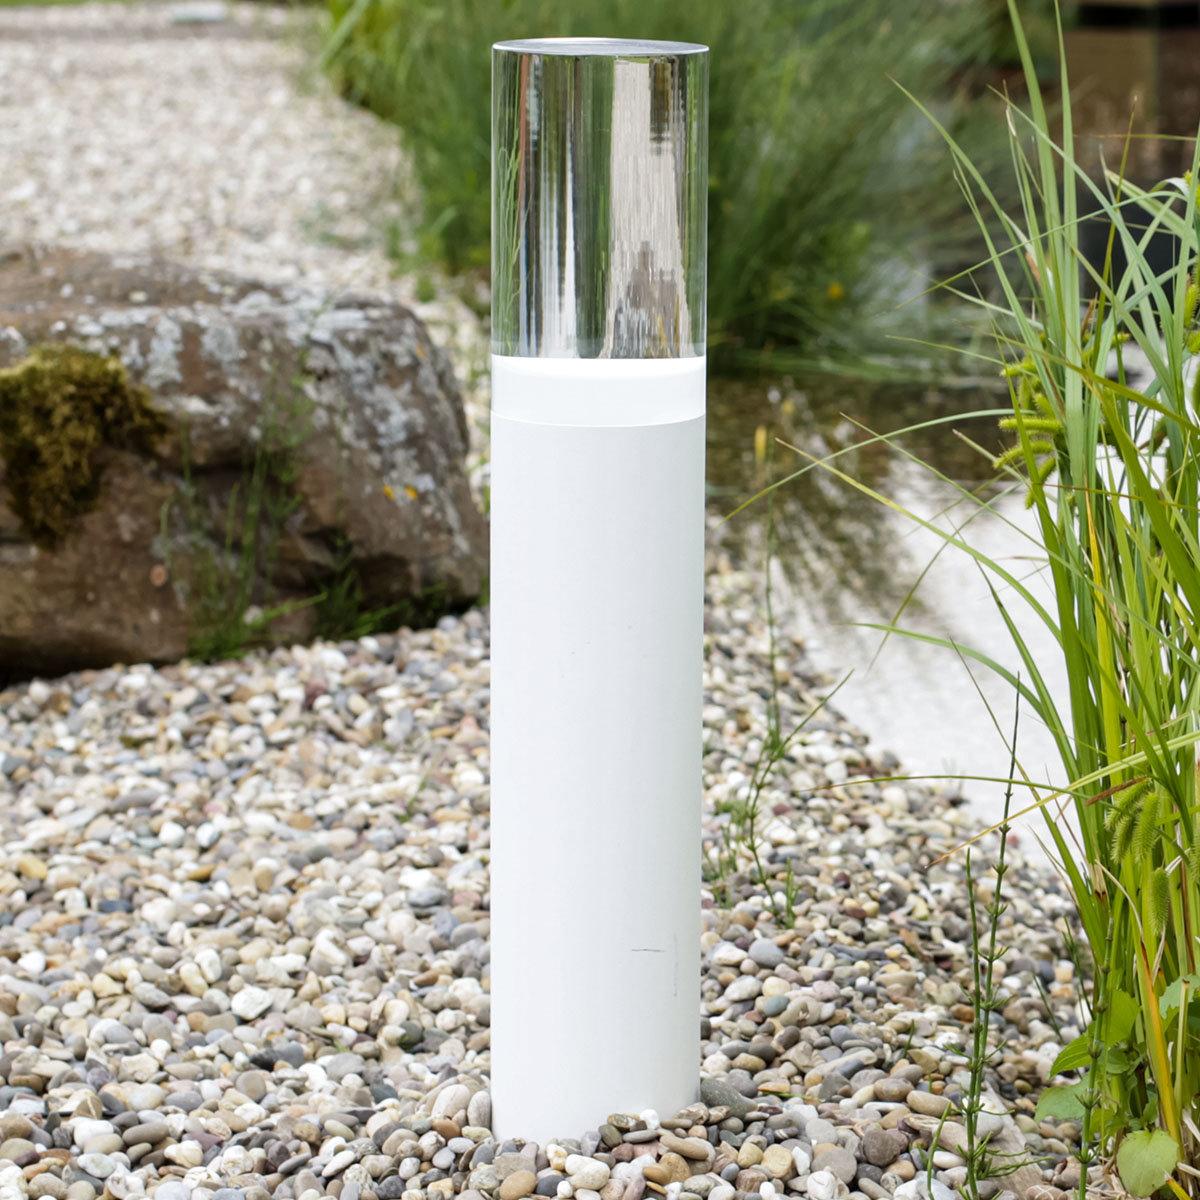 Smart Light Uferleuchte, 3 W, Metall, warmweiss | #2